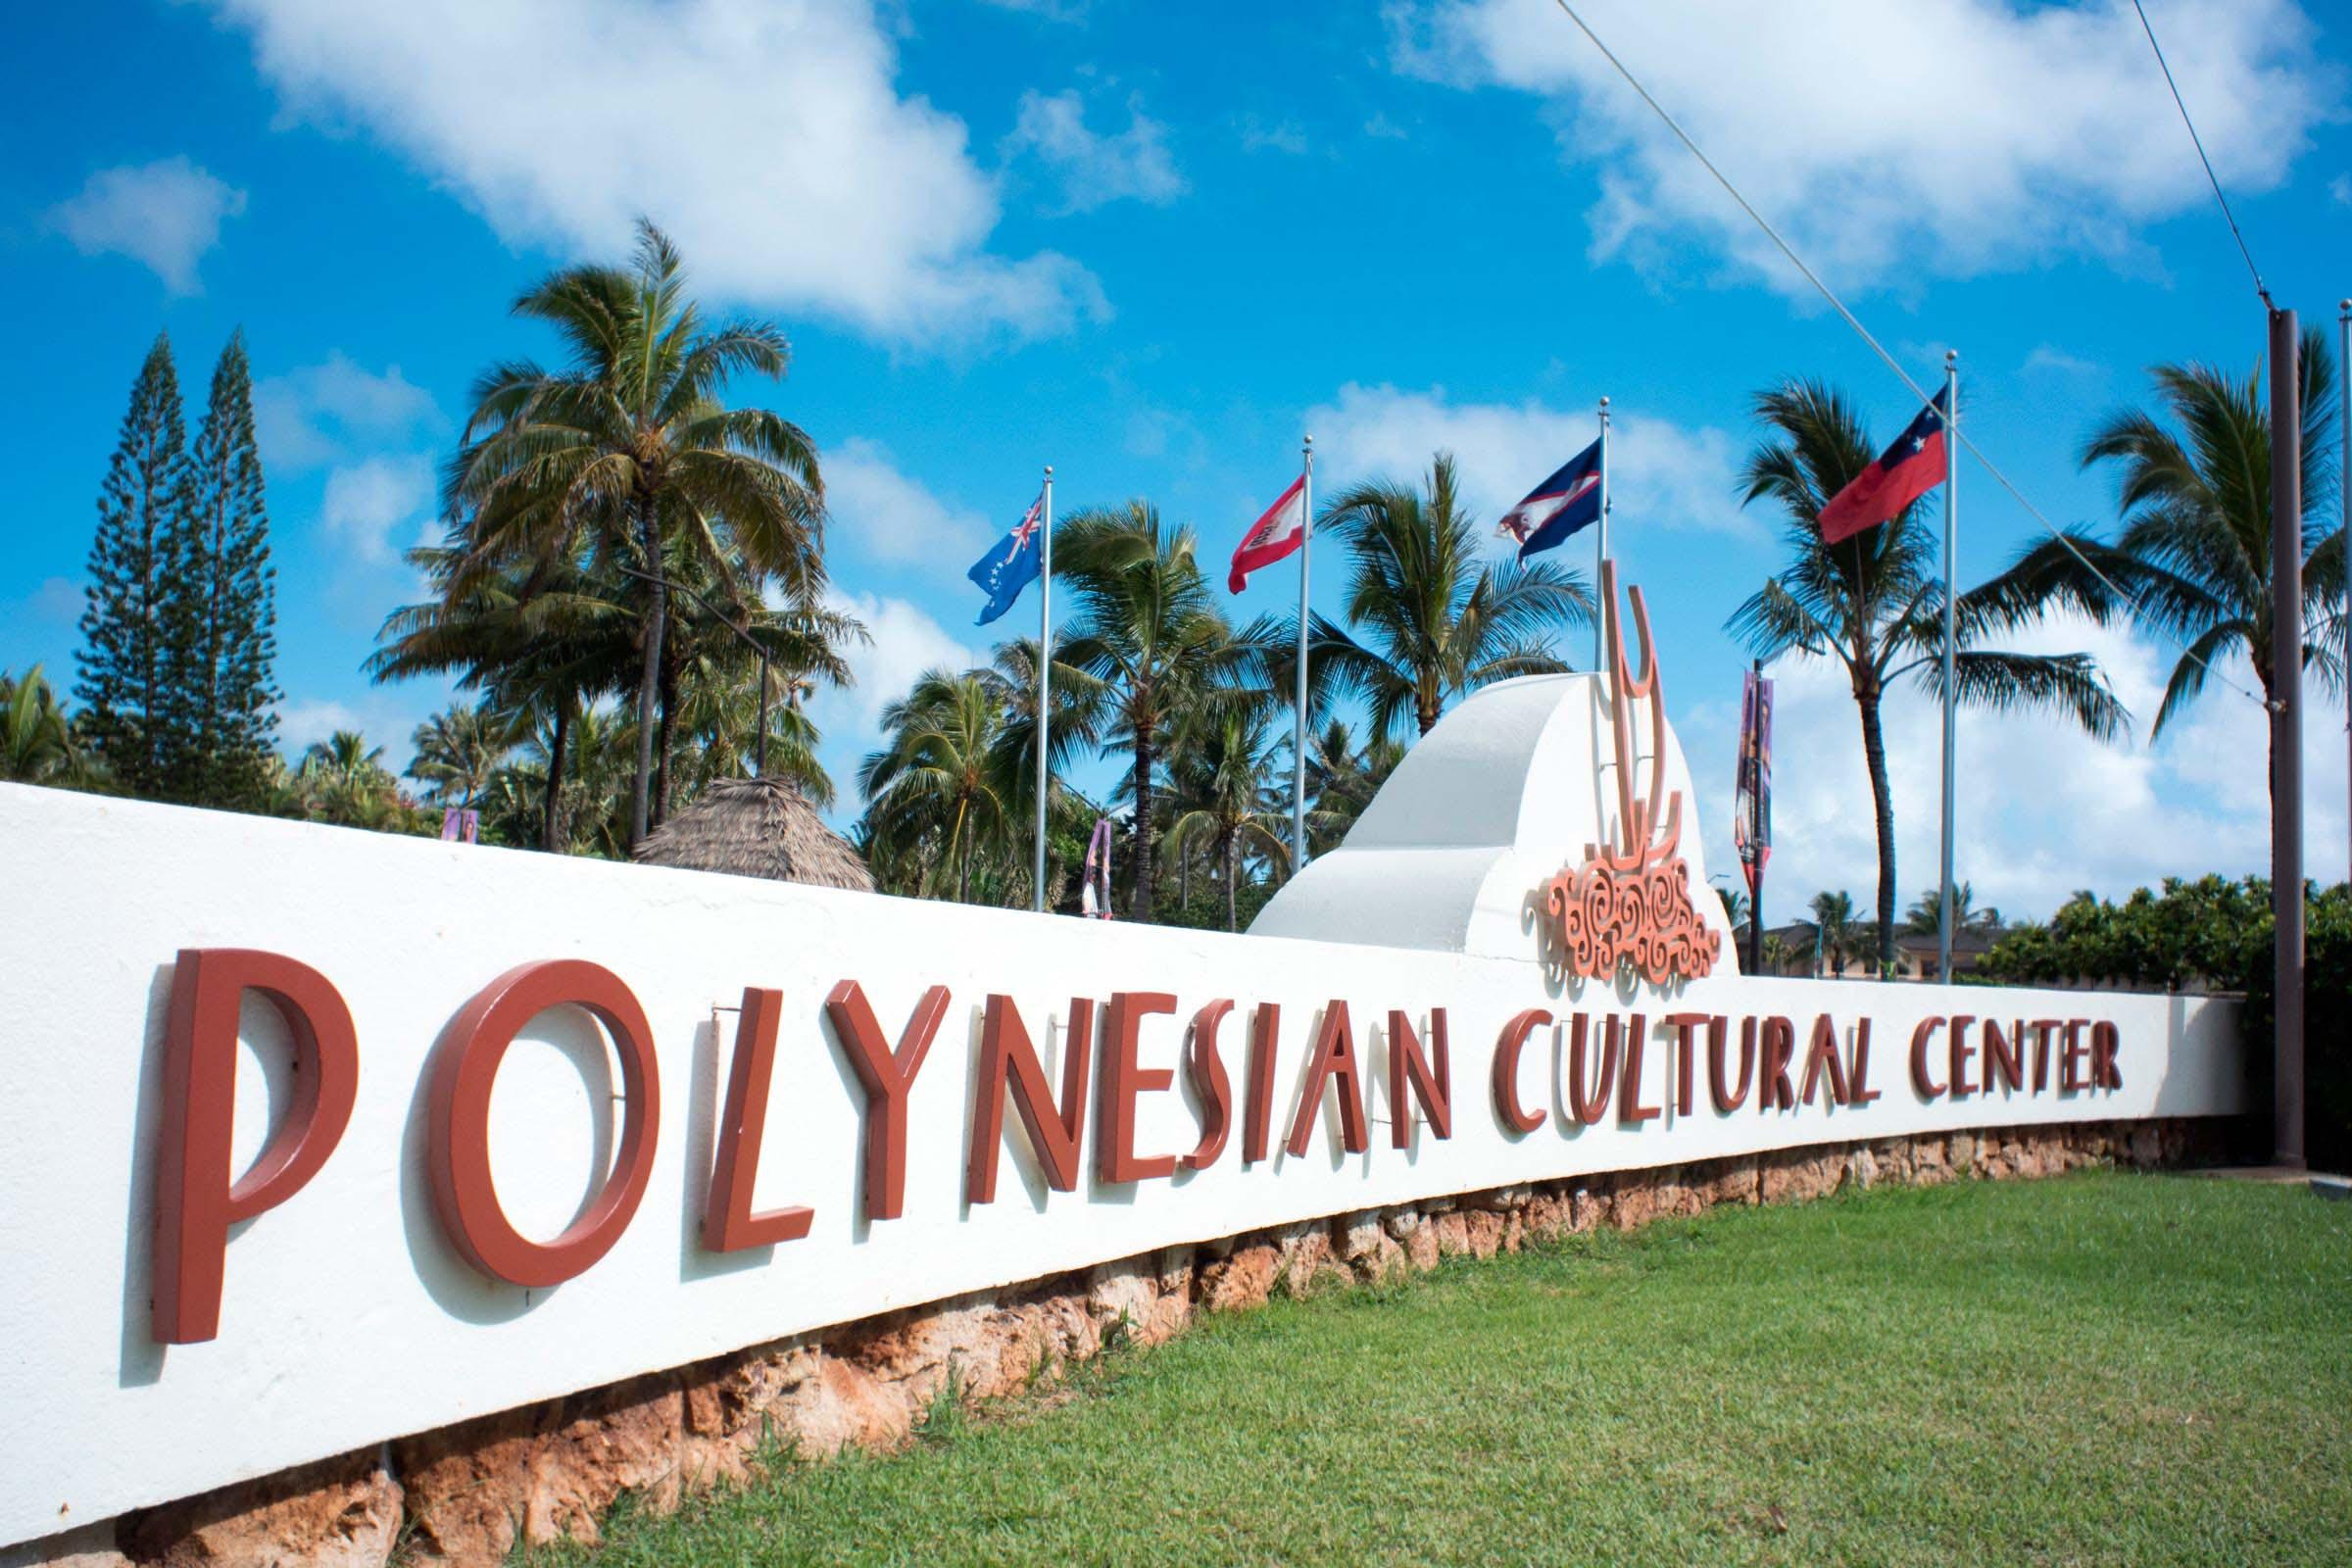 Polynesian-Cultural2.jpg